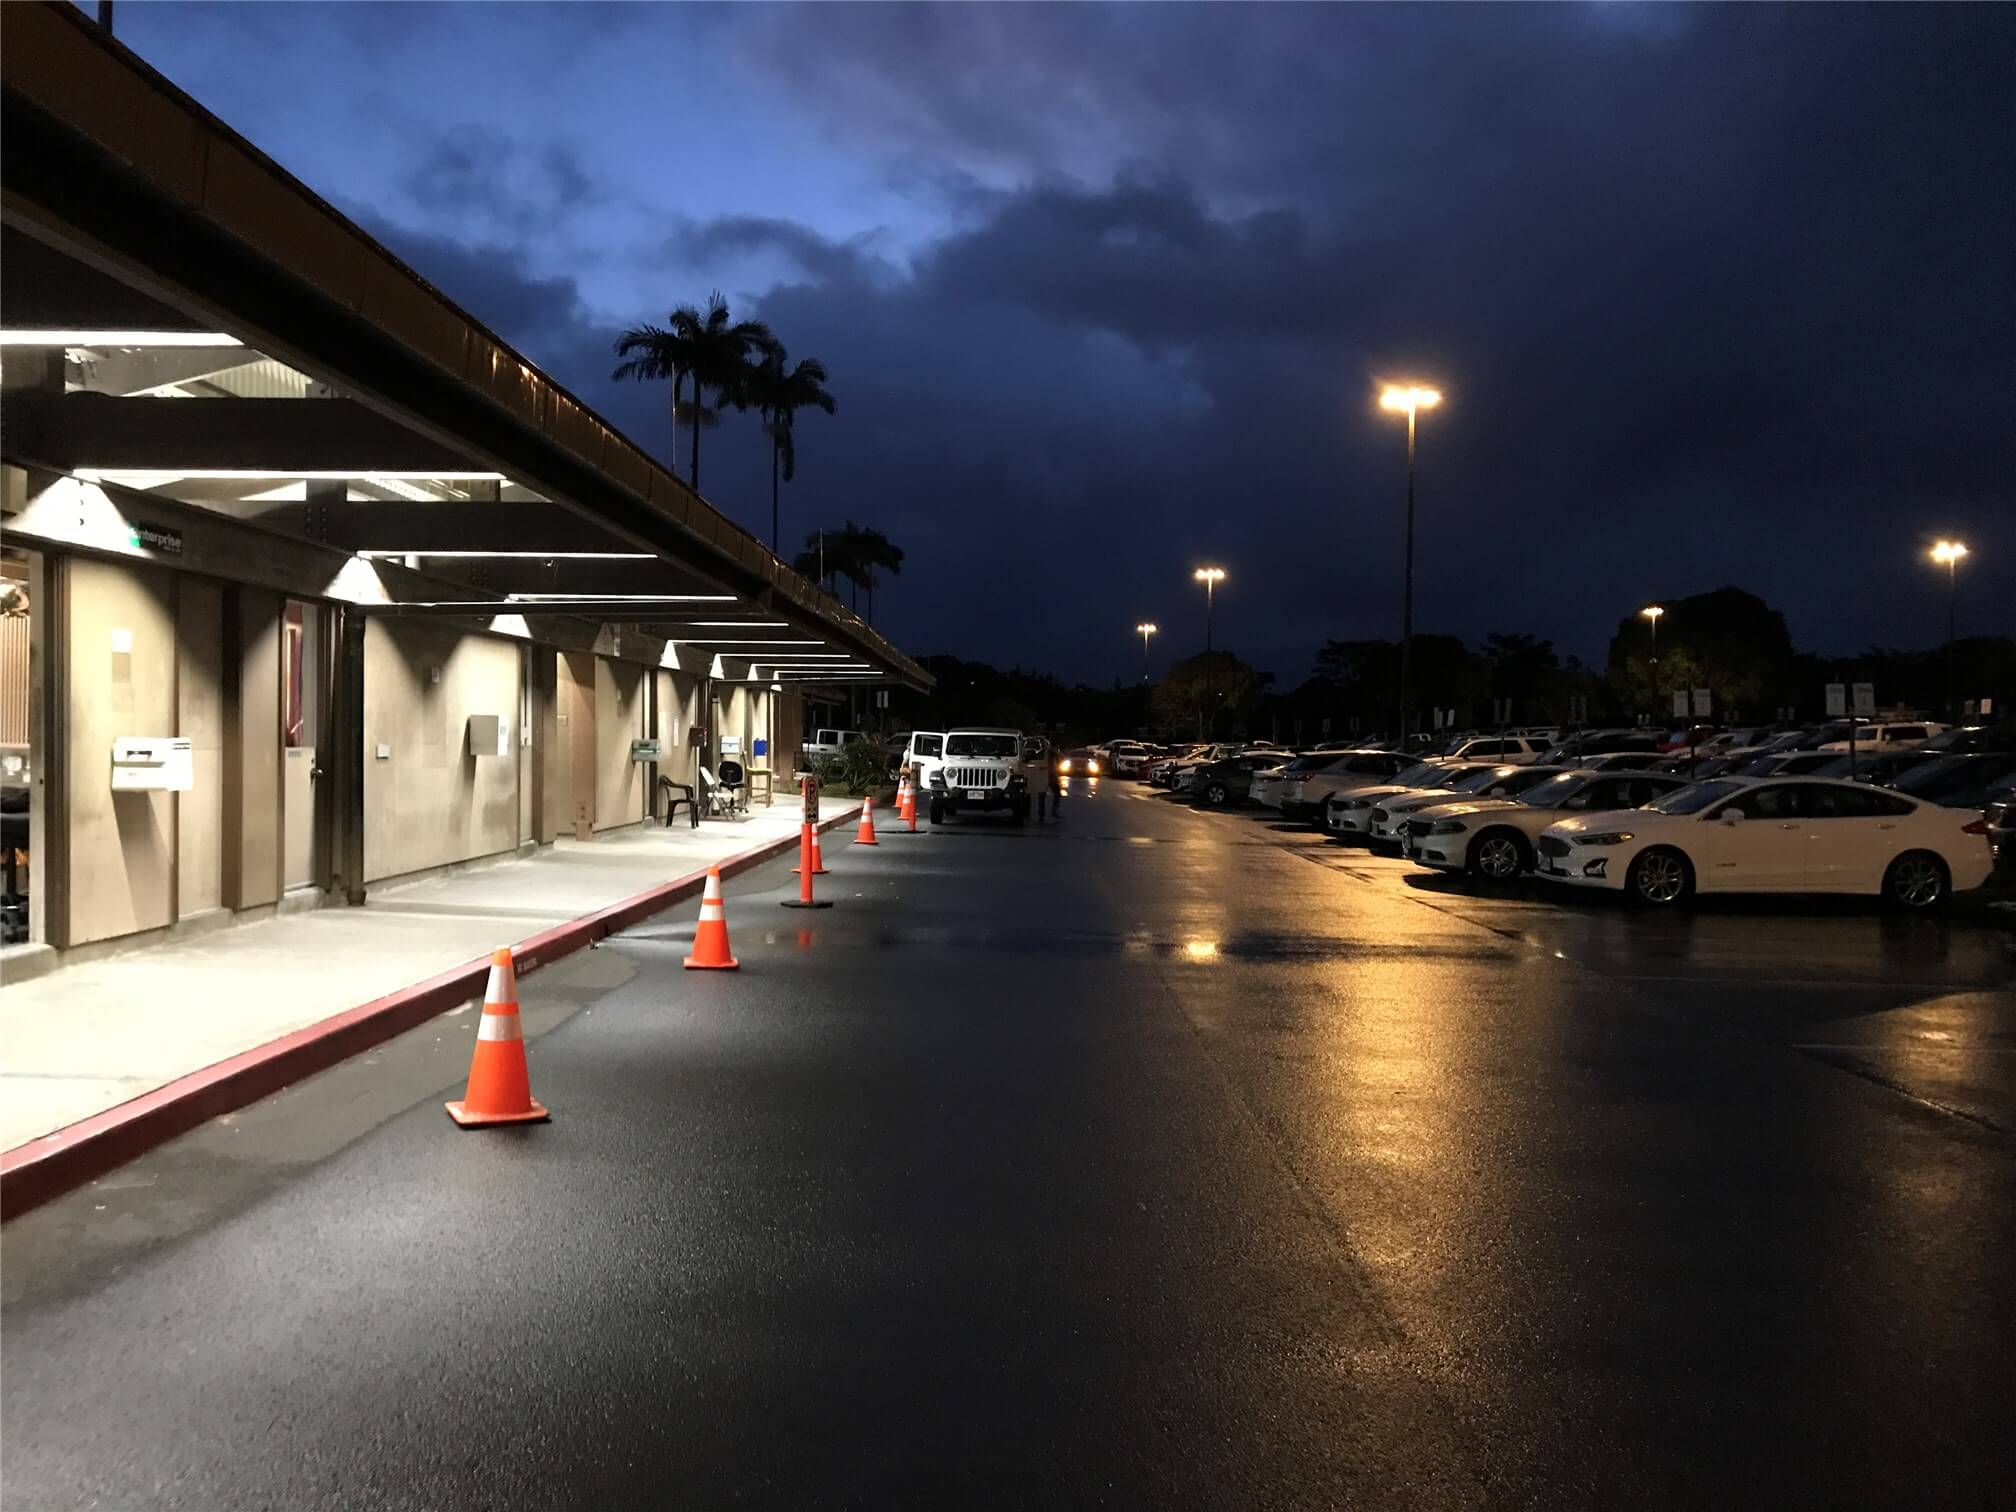 hilo ito Airport car rental1